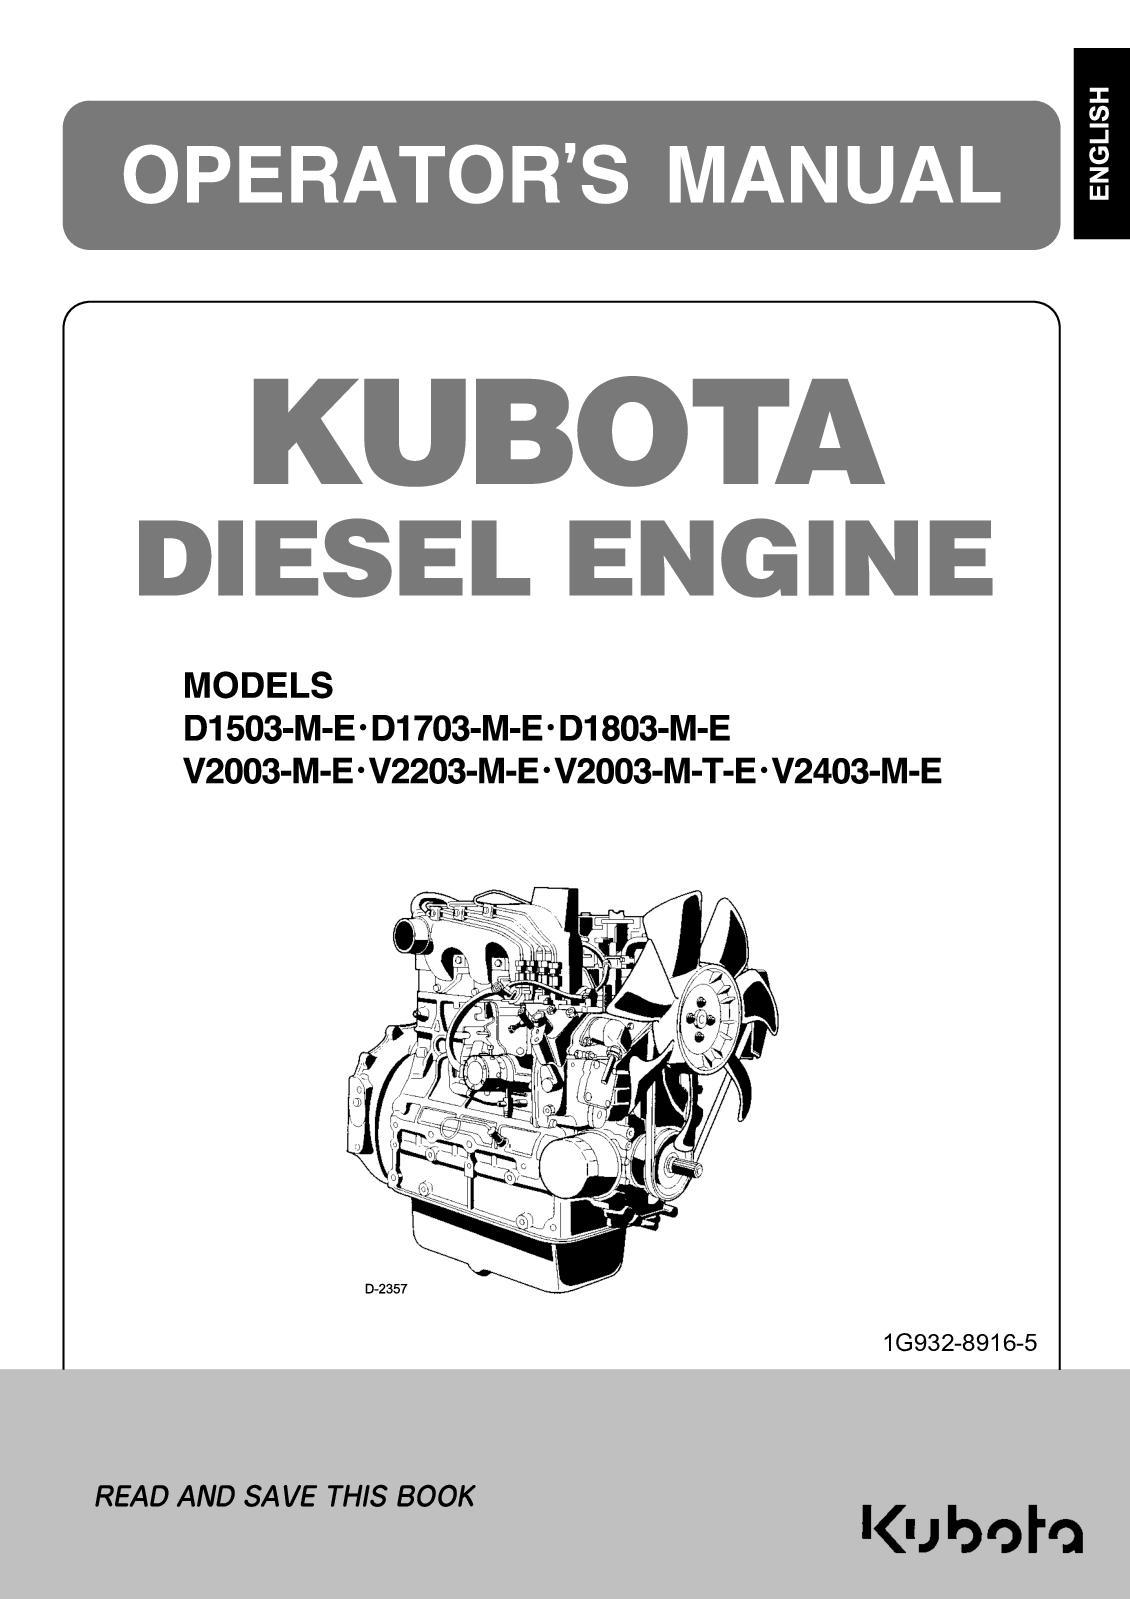 Calaméo - Kubota Engines D1503 Me D1803 Me V2203 M V2403 Me Ops